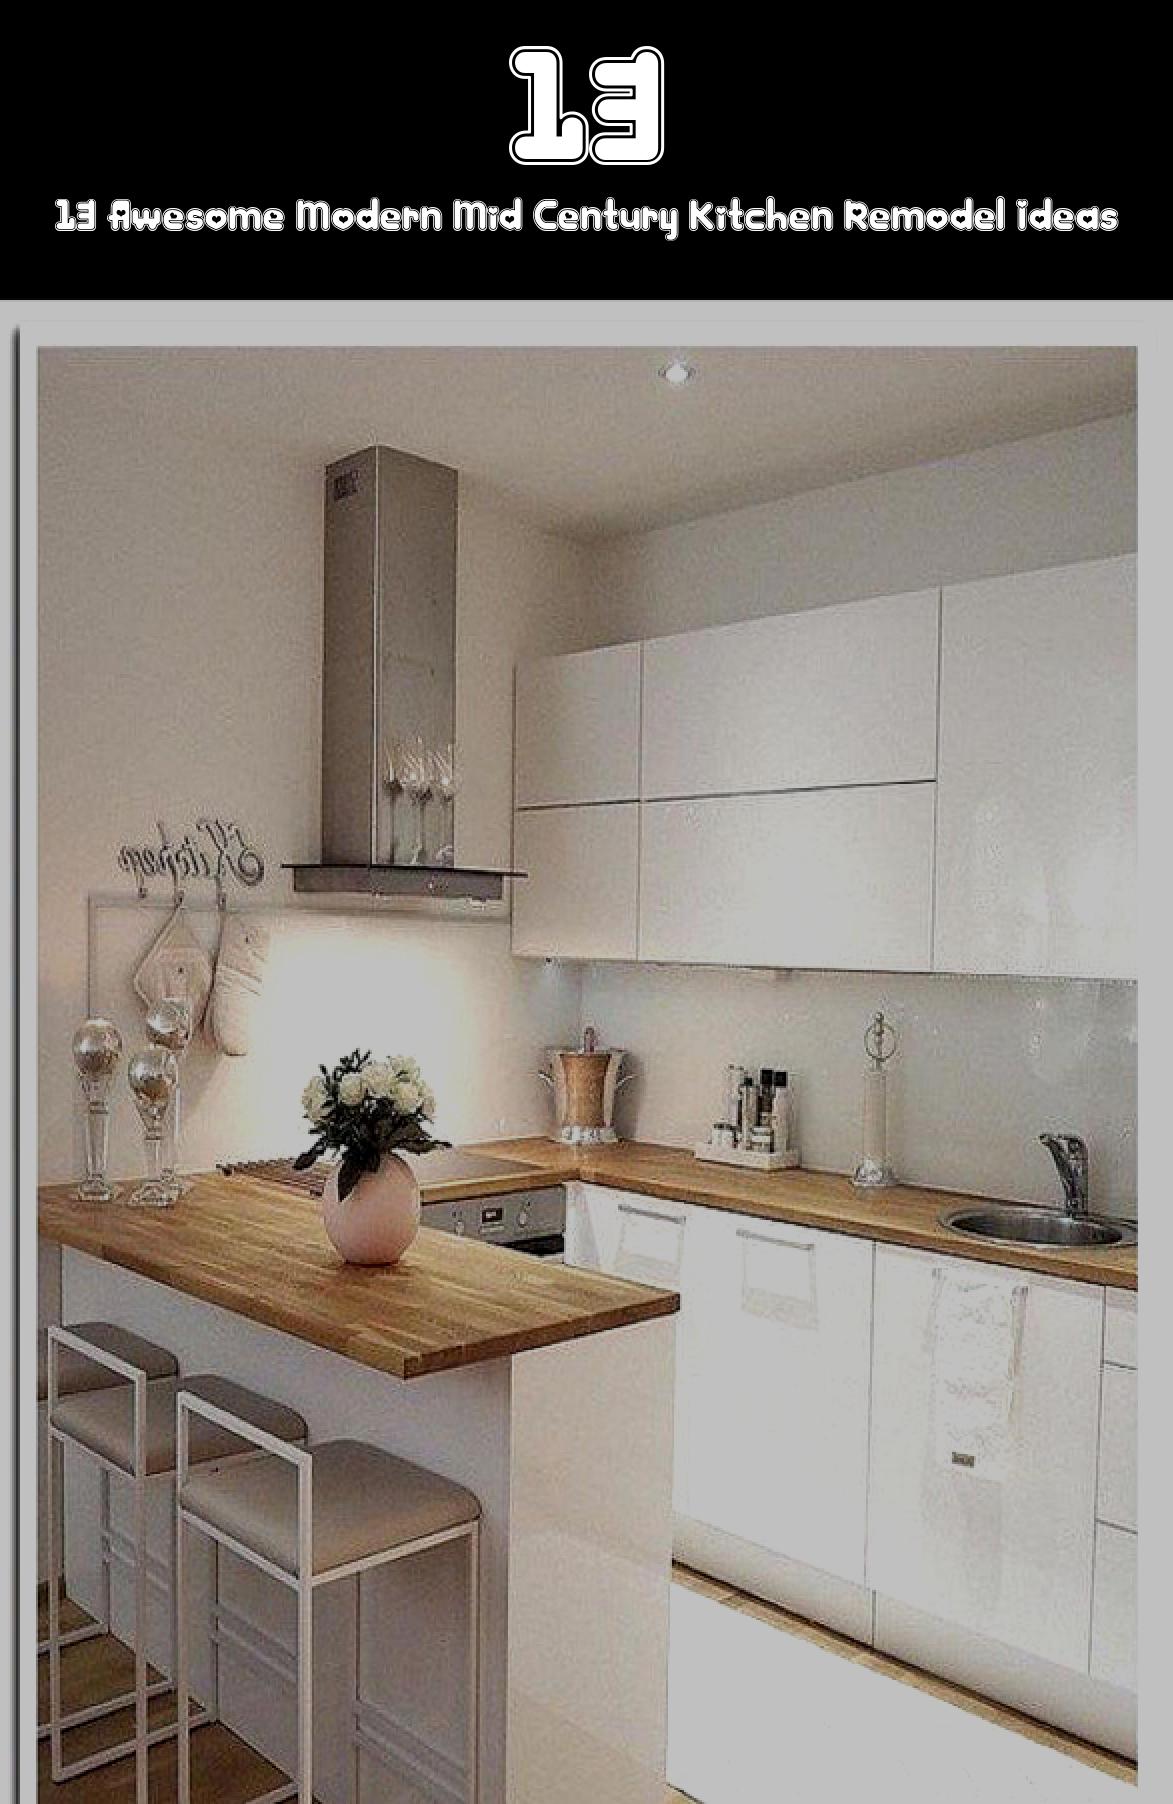 Tumblr In 2020 Kitchen Inspiration Design Kitchen Remodel Small Kitchen Room Design